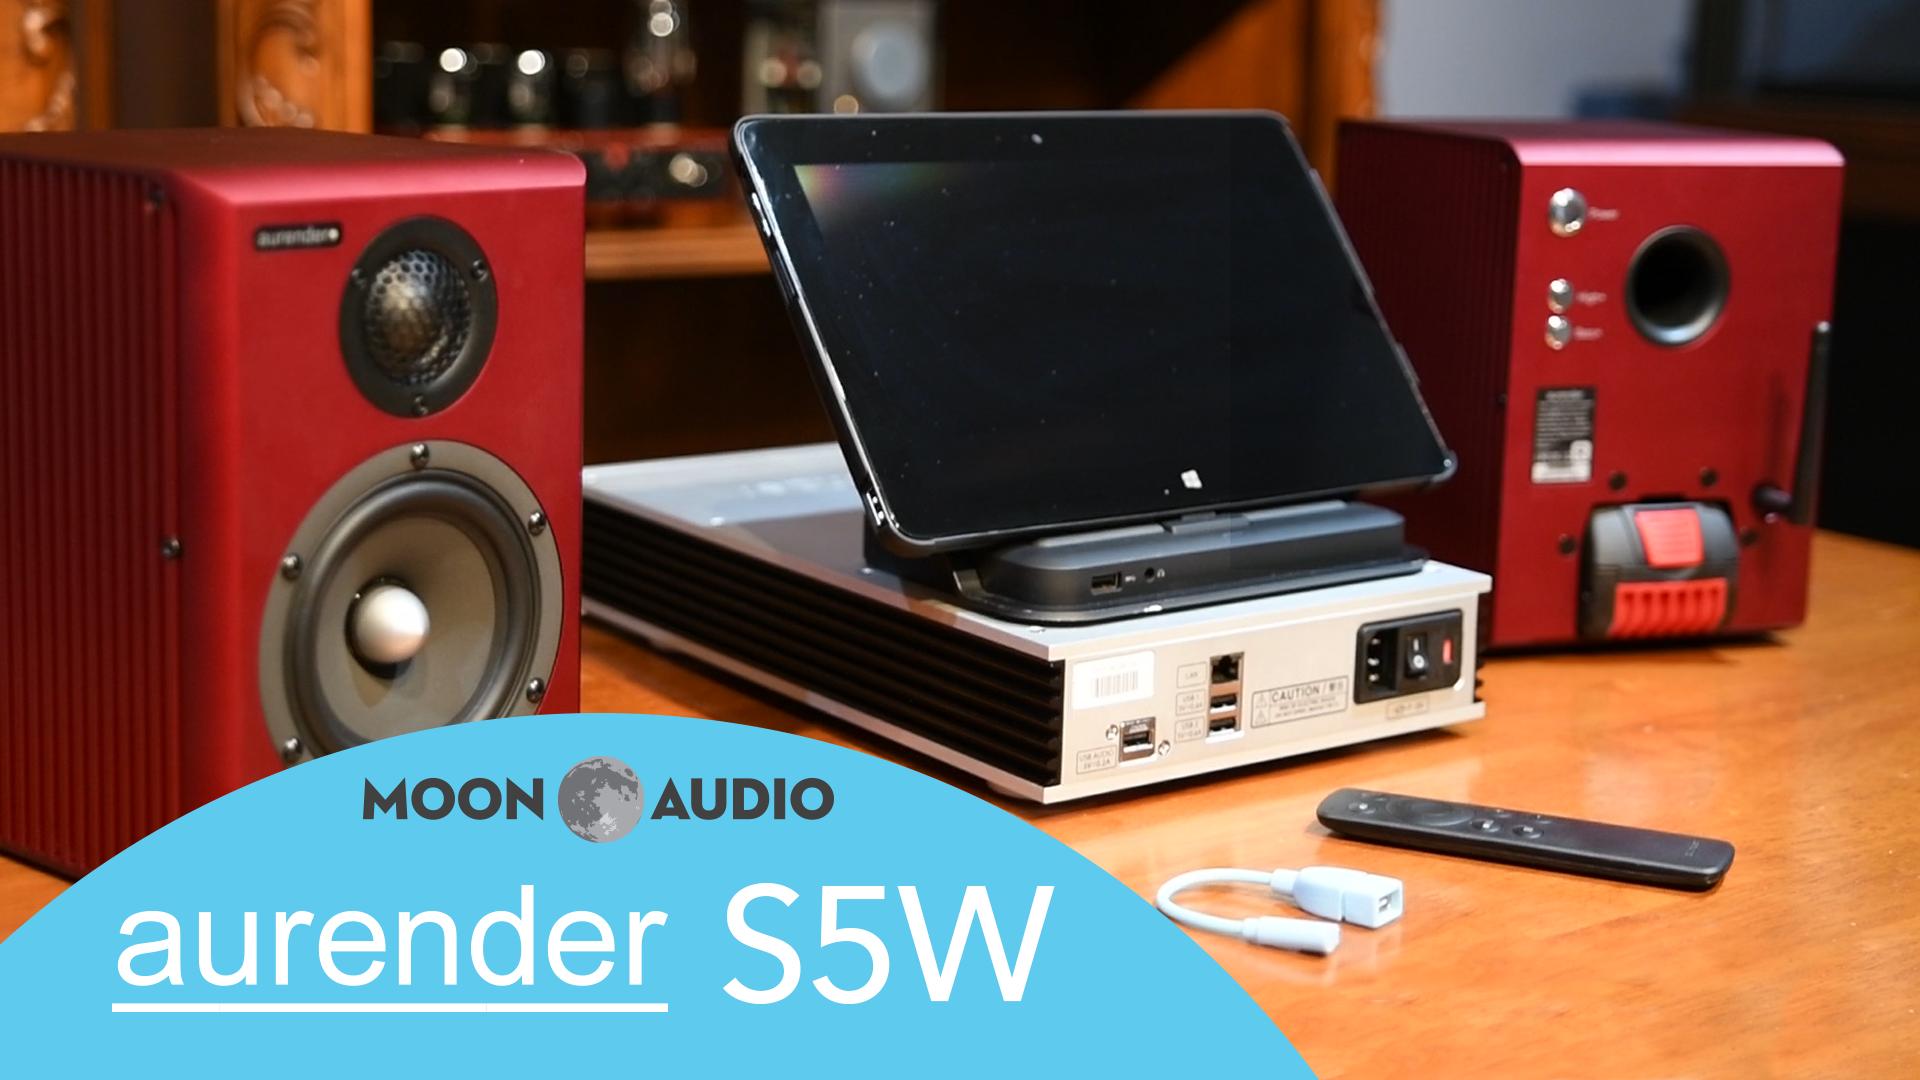 Aurender S5W Speaker Video Review